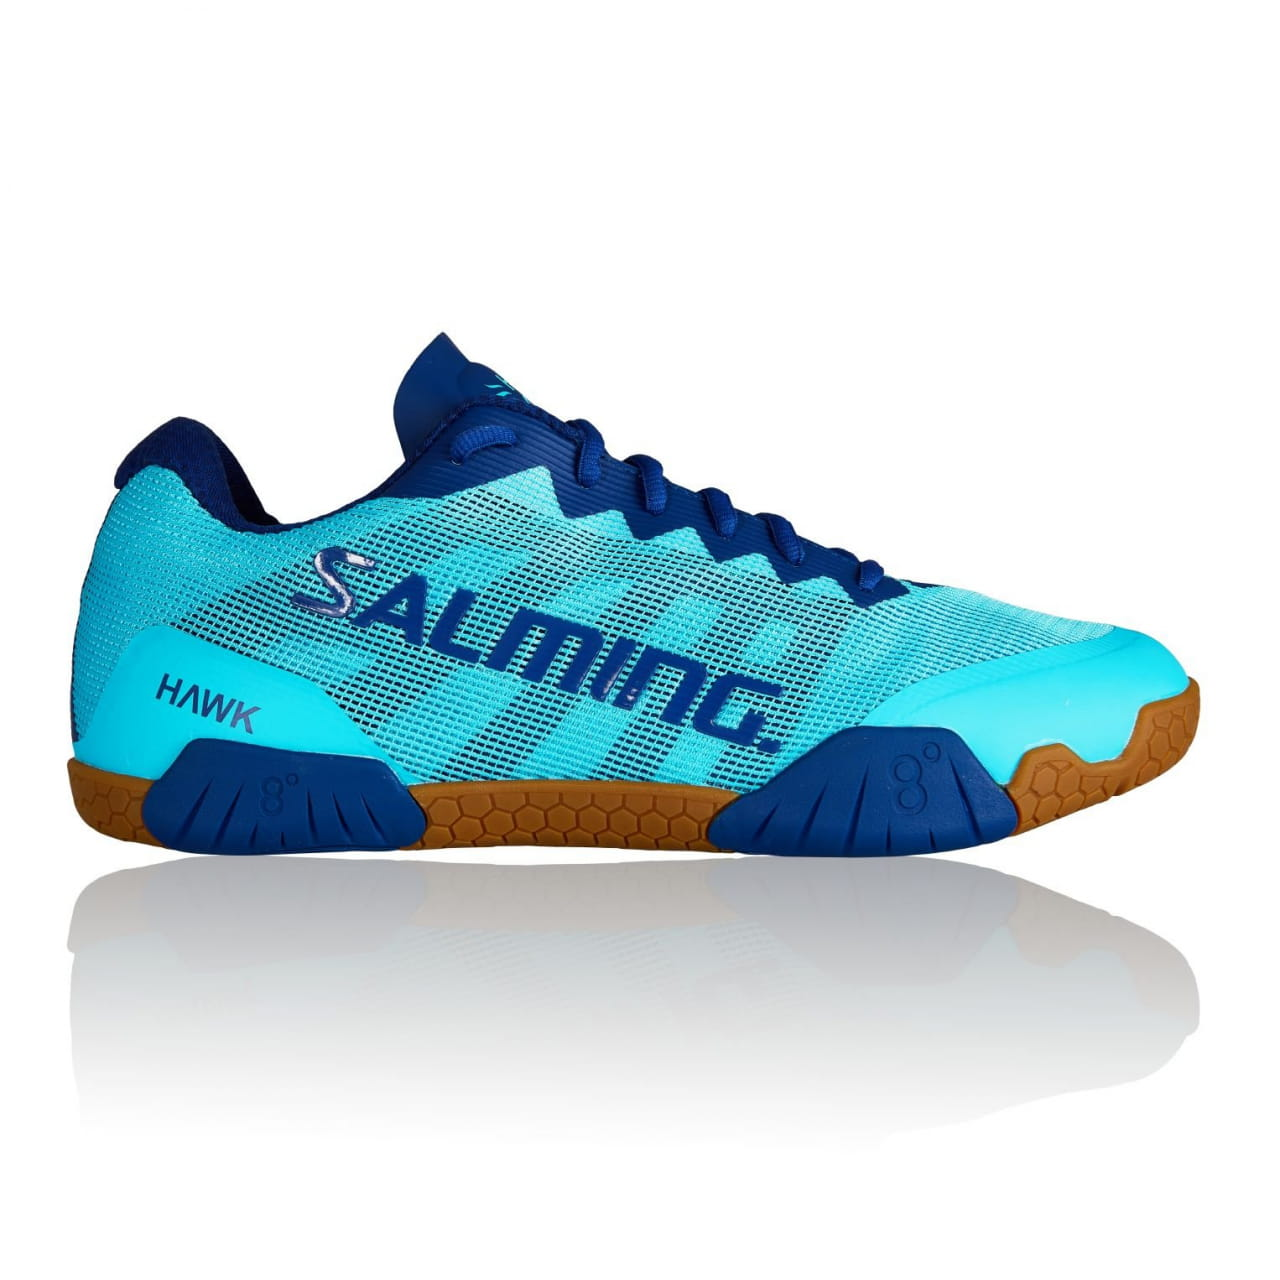 Halová obuv Salming Hawk Shoe Women Deco Mint